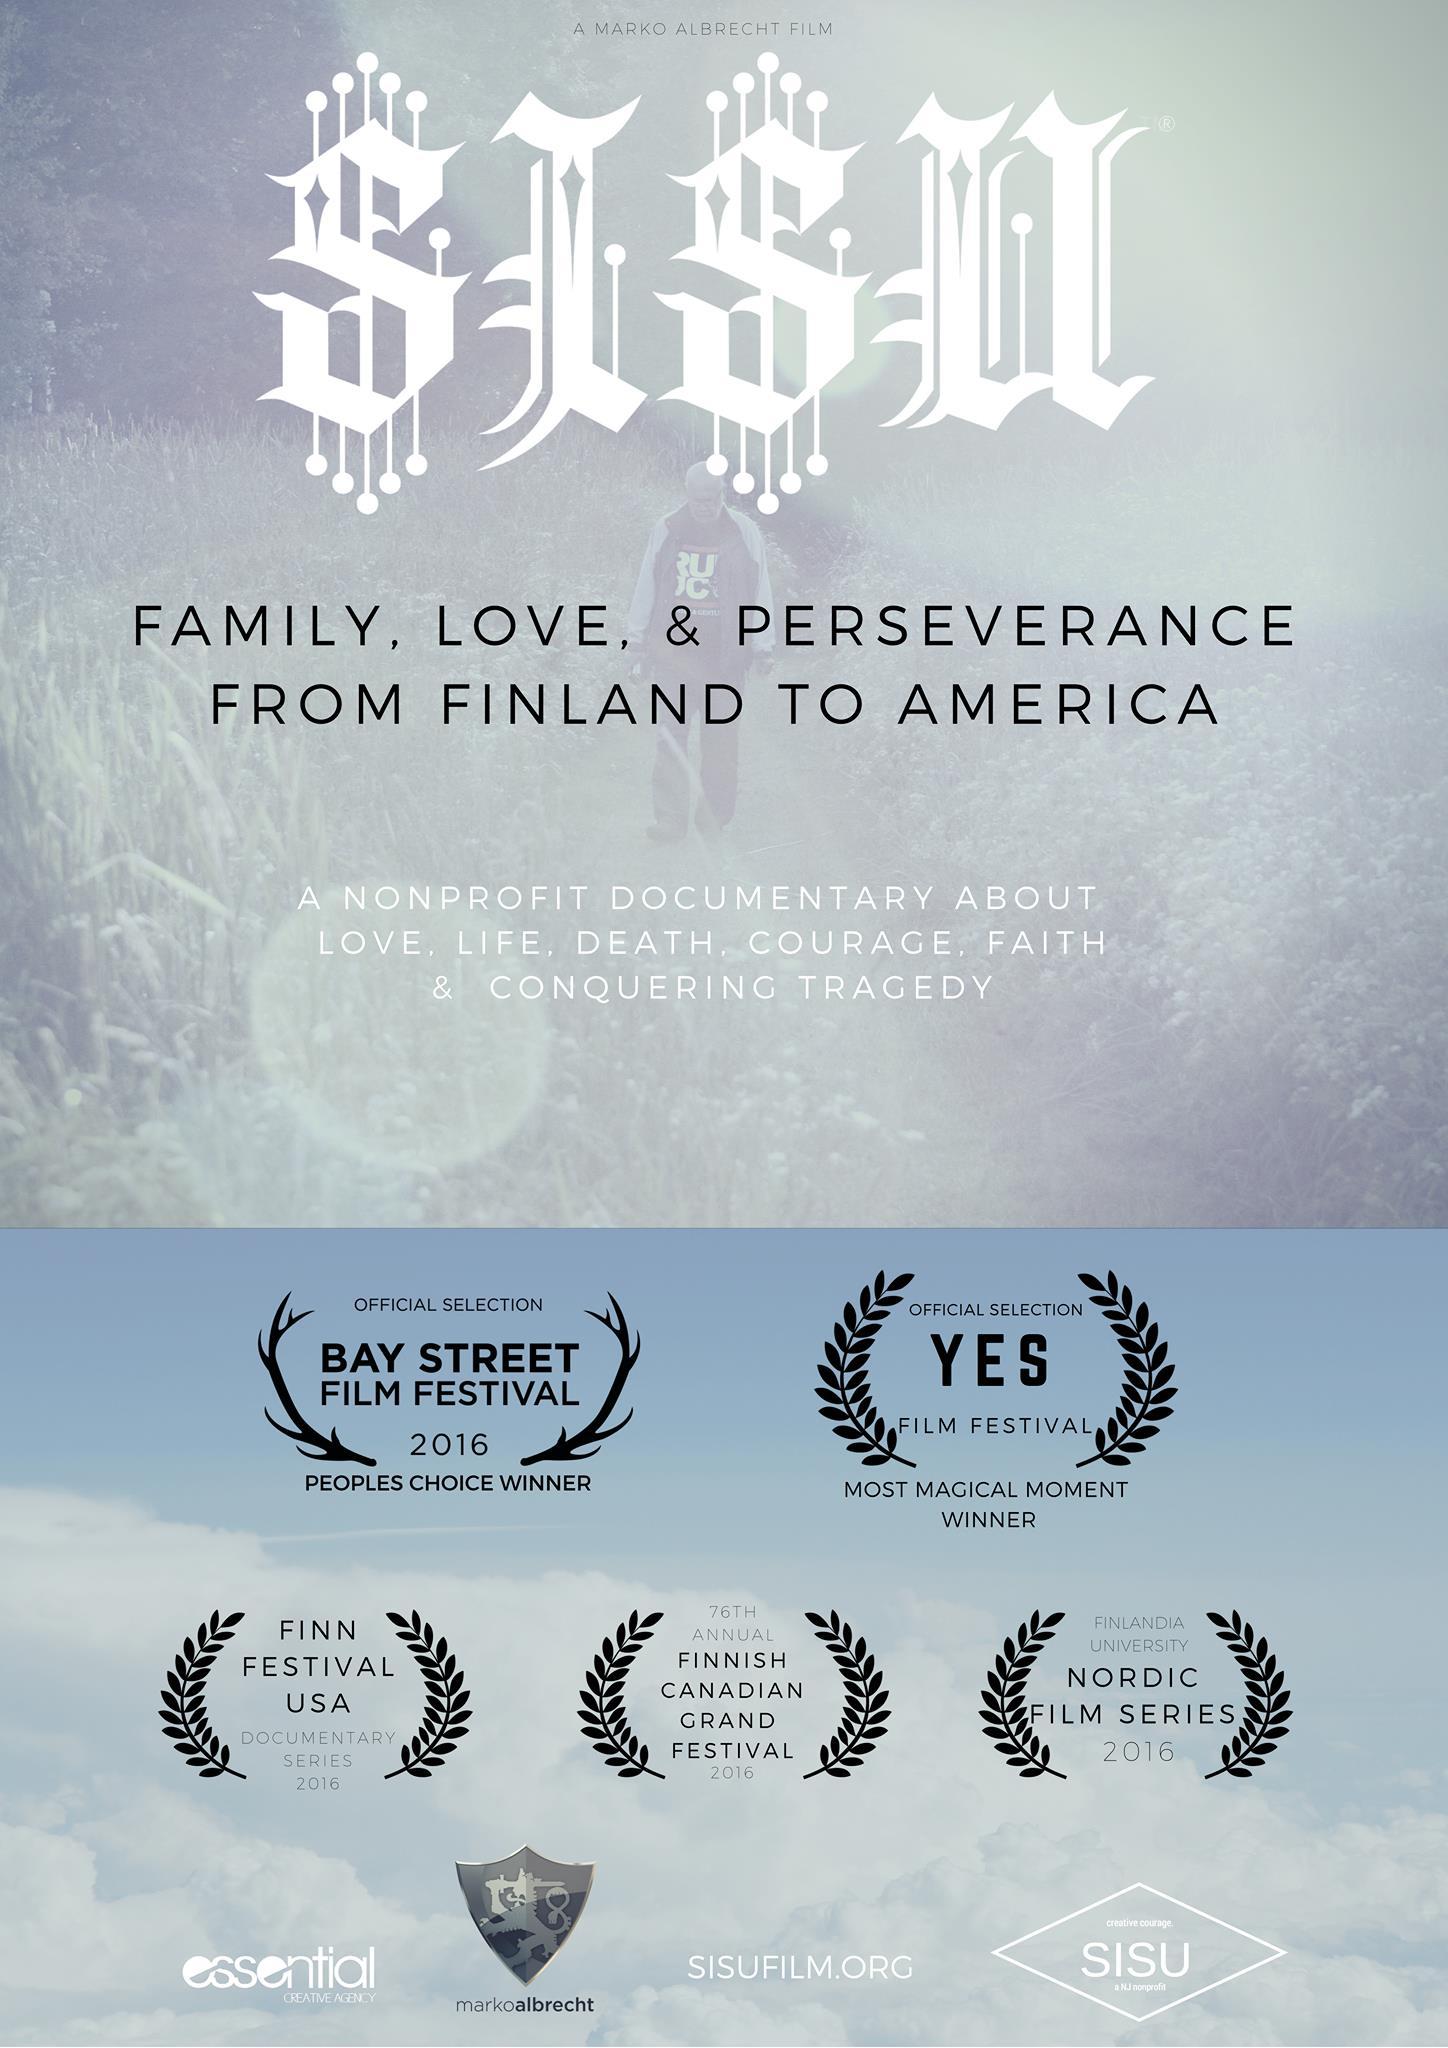 SISU documentary poster 2016. A Marko Albrecht film.